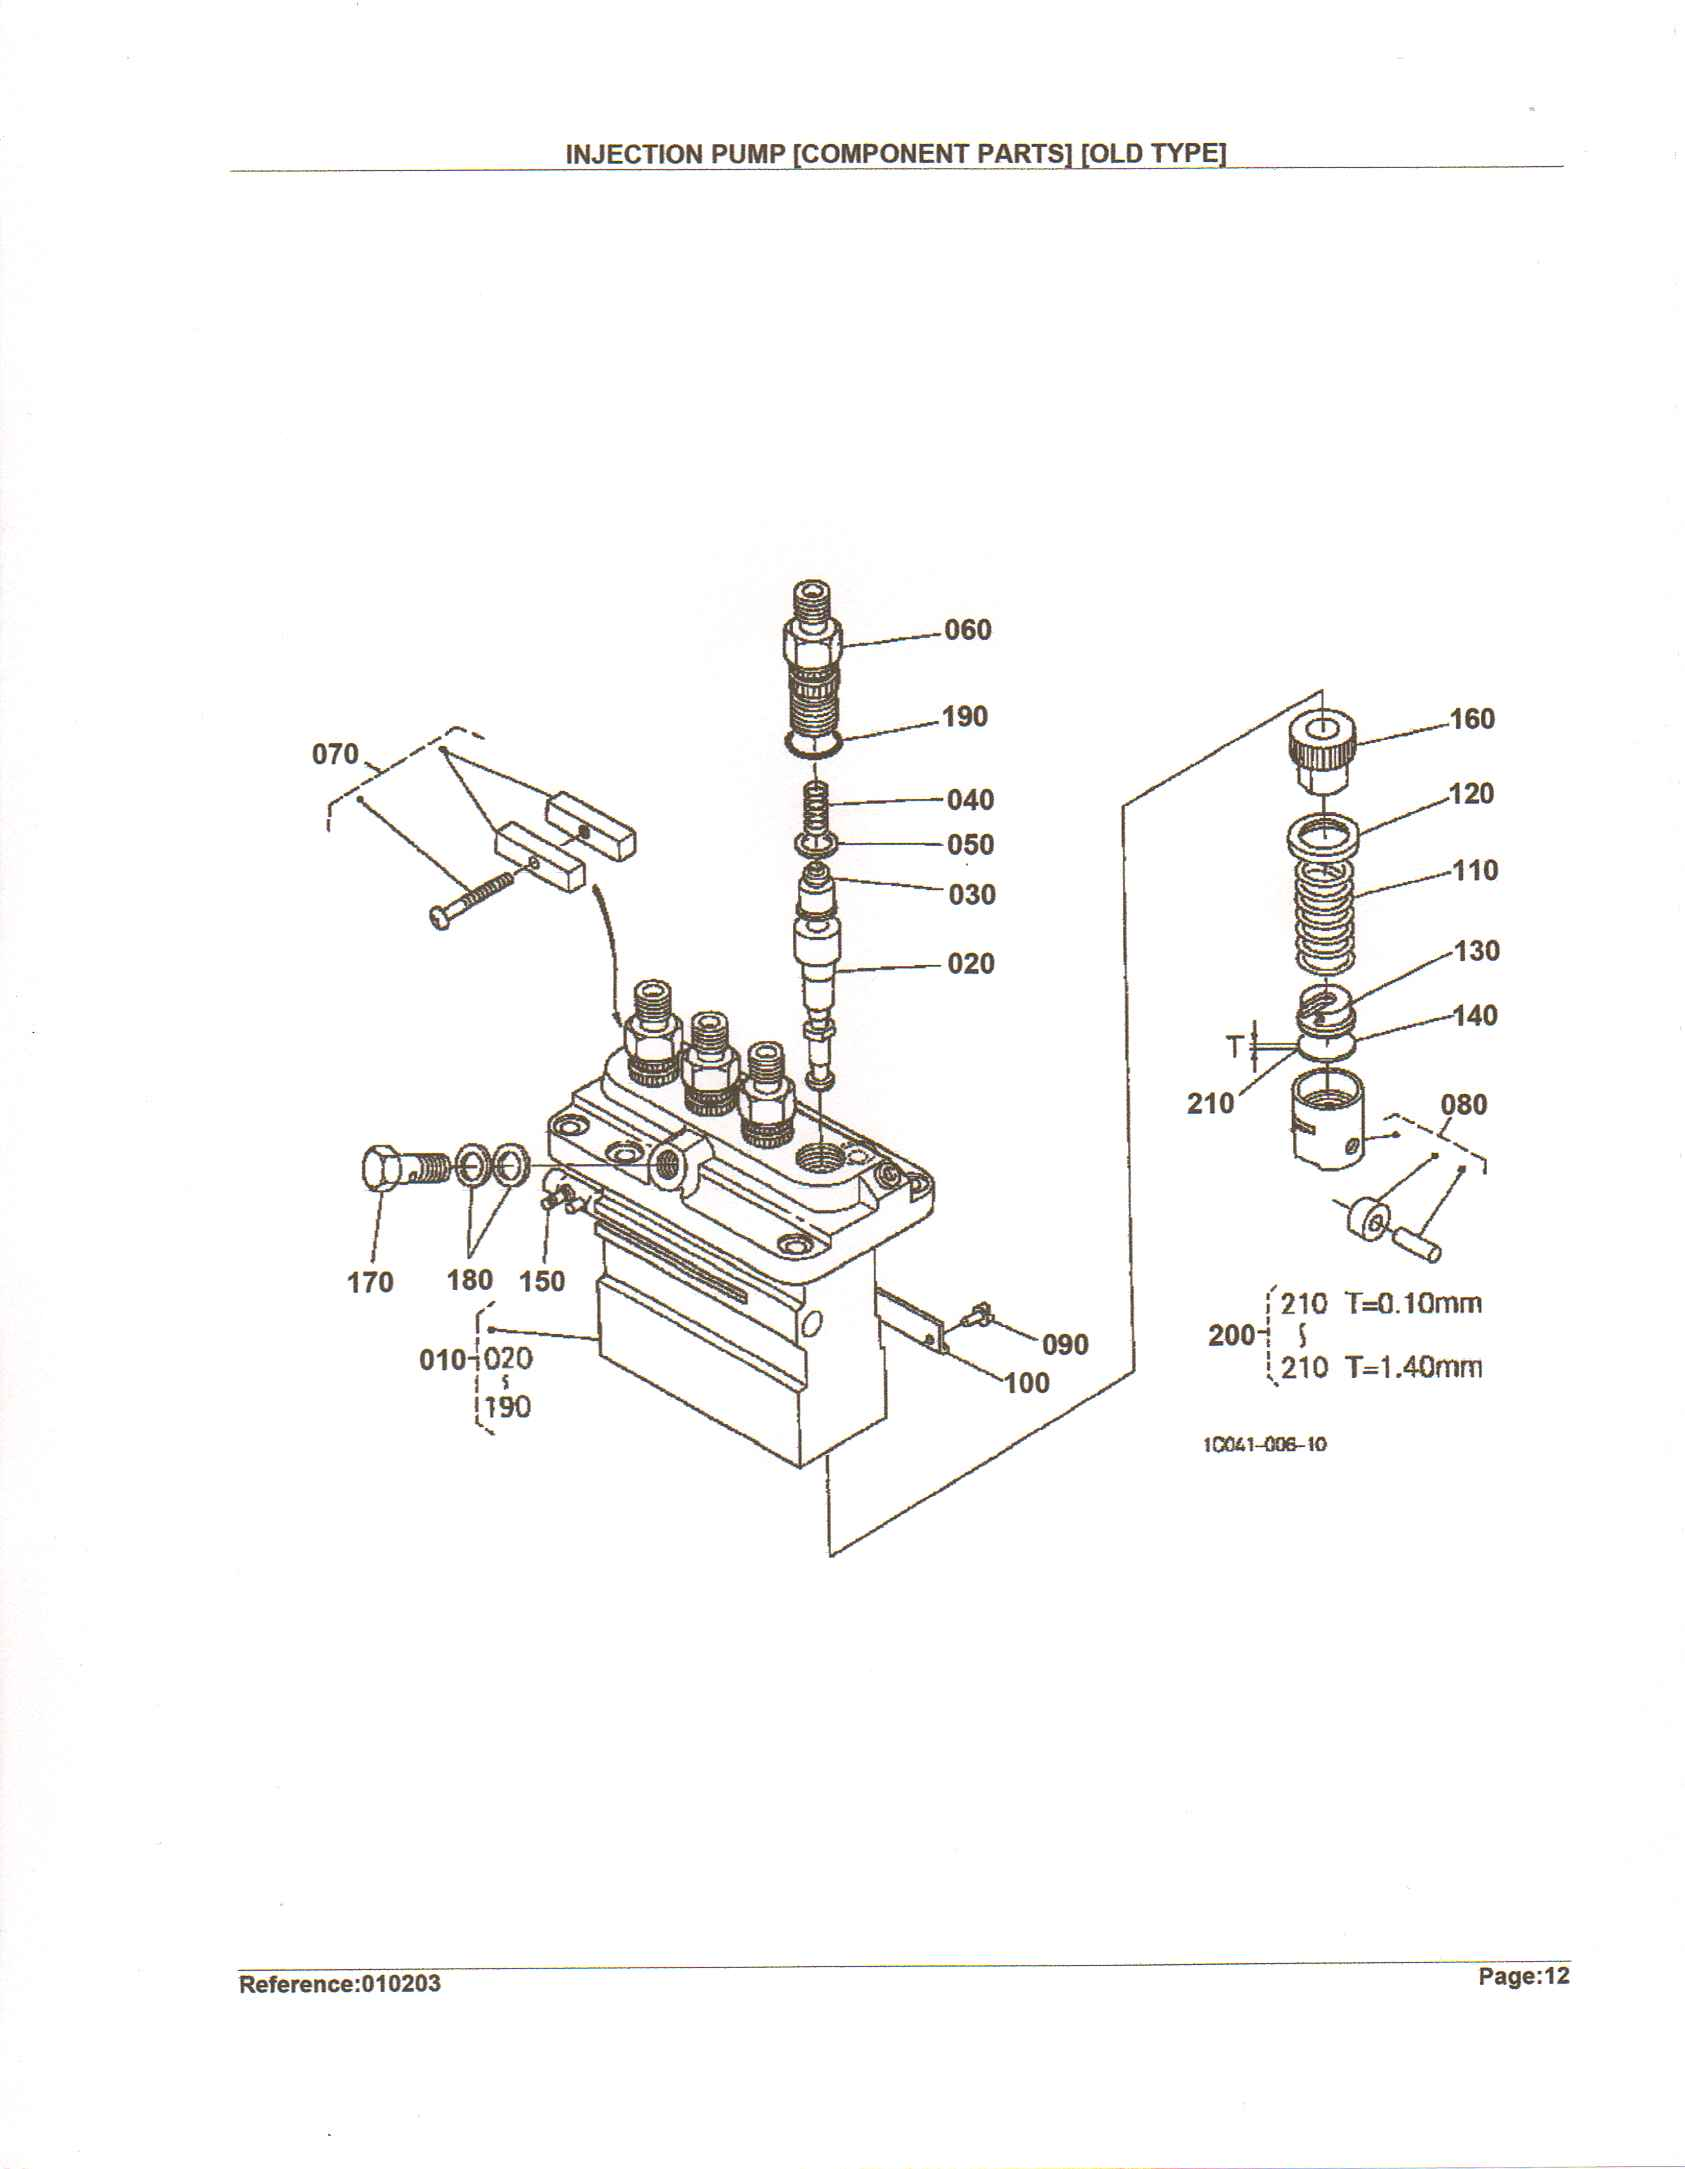 4 cyl kubota diesel motor  injectorn pump  eng no v